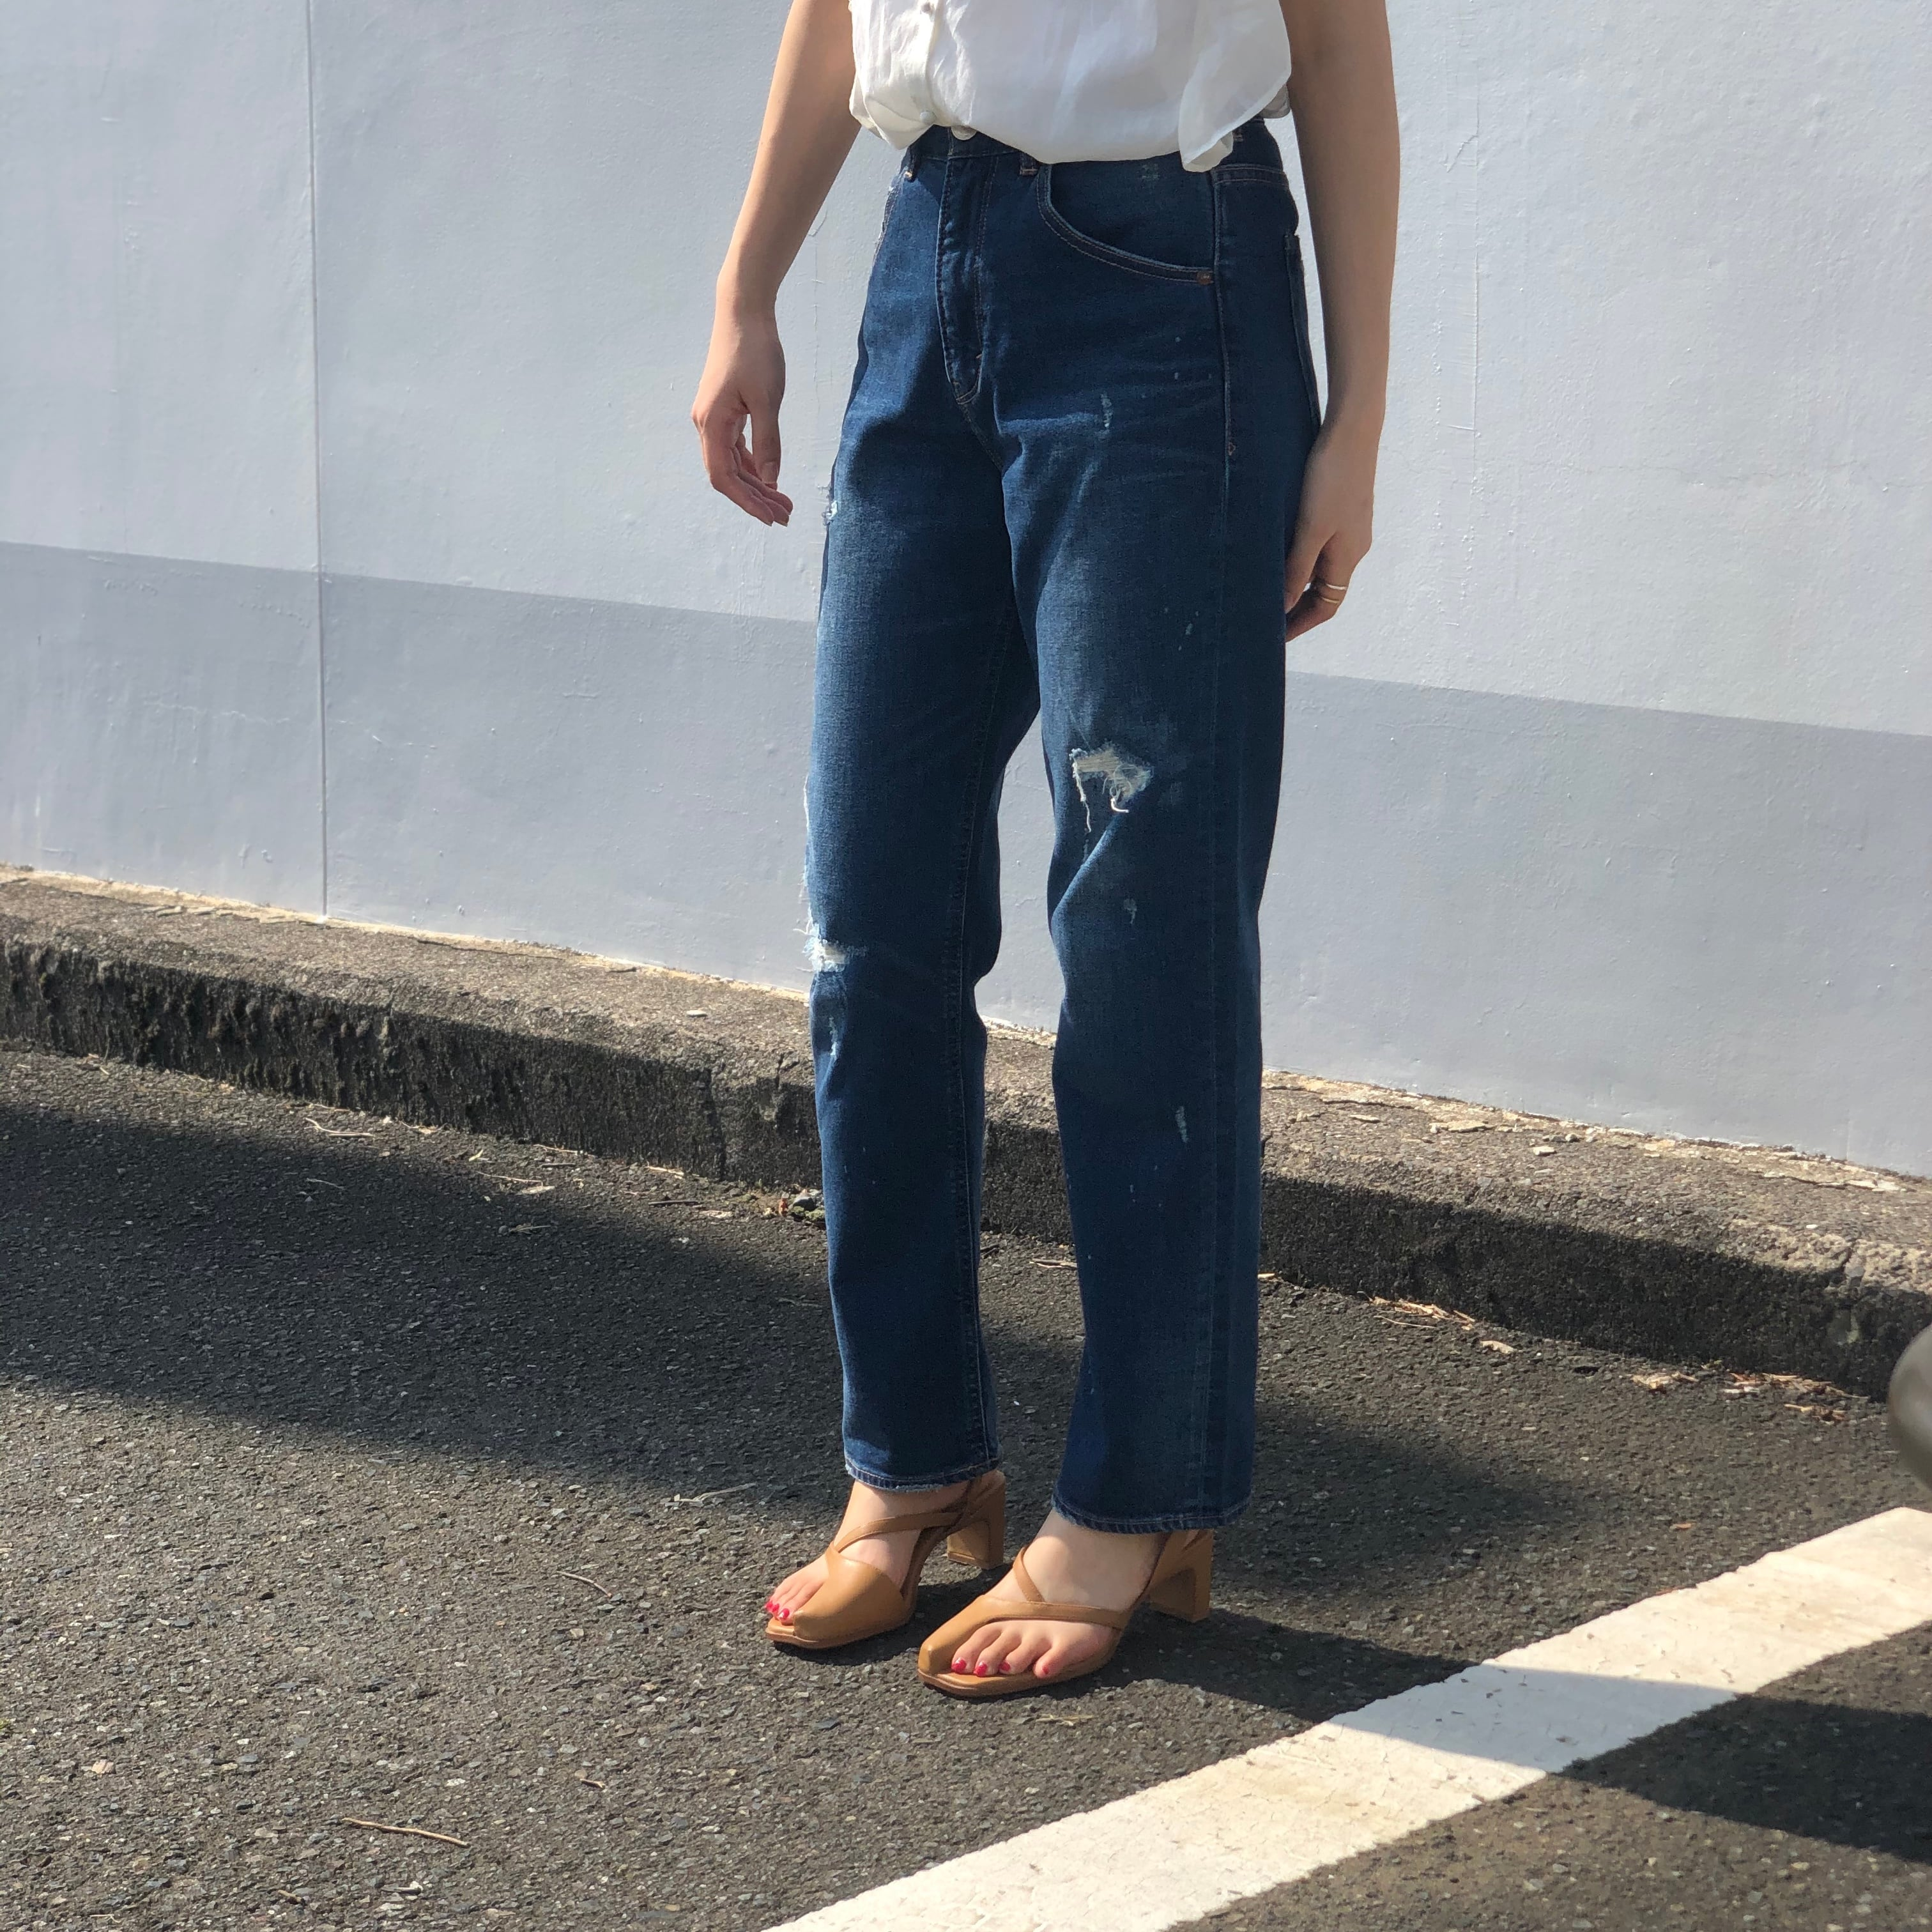 【 ANTGAUGE 】- C1734 - ダメージデニムパンツ